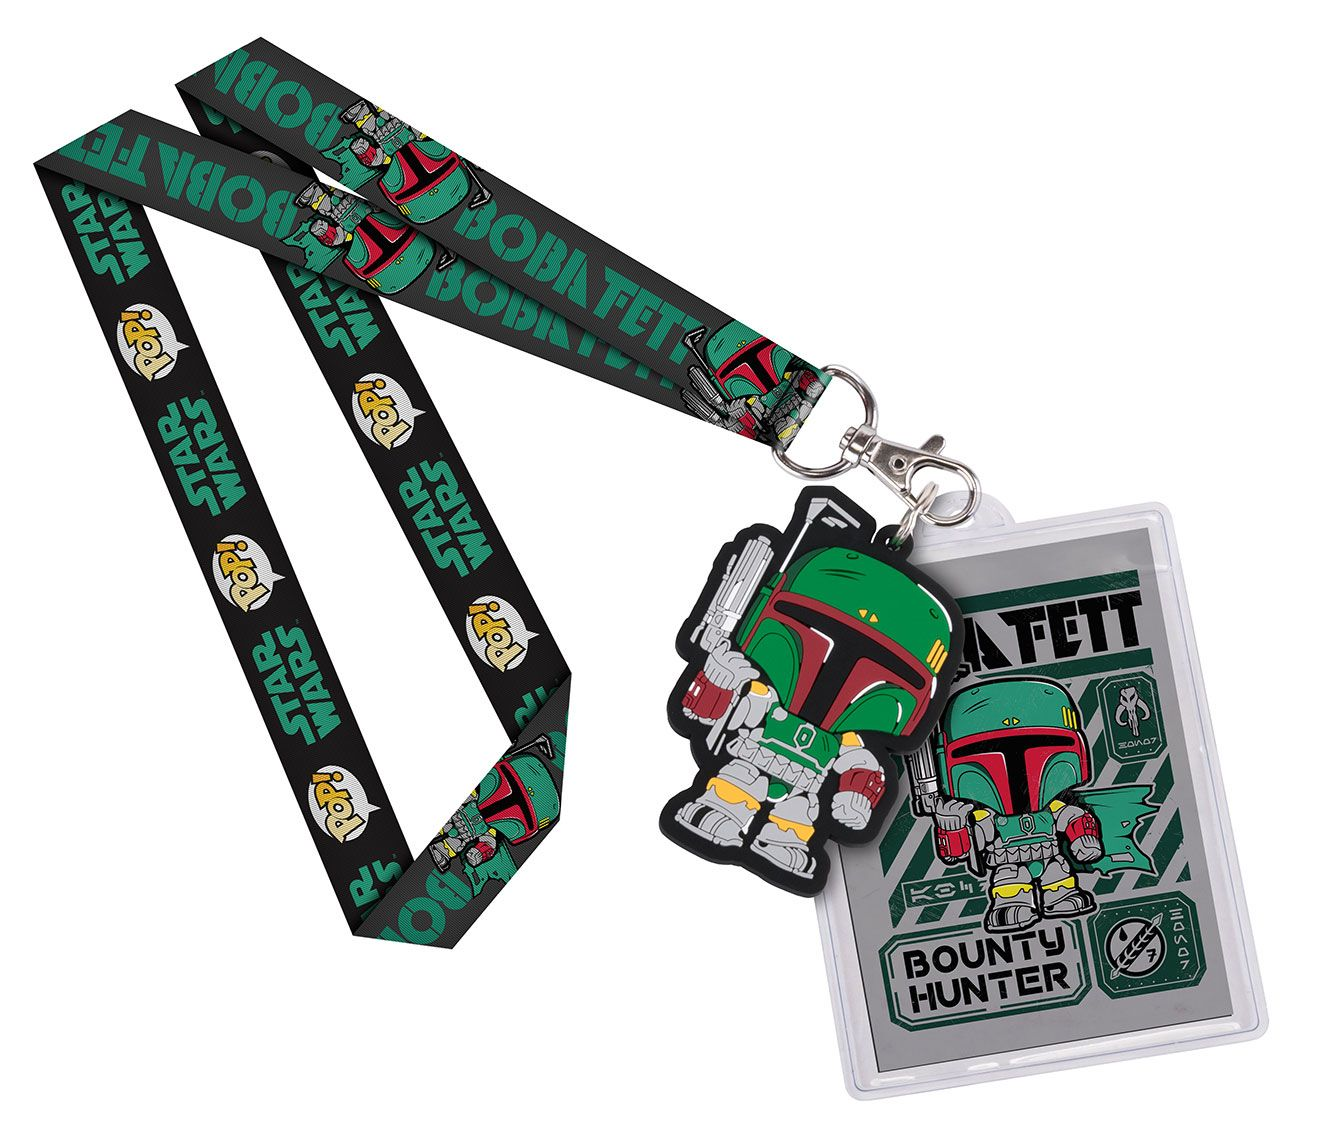 Star Wars POP! Lanyard with Rubber Keychain Boba Fett & Backer Card